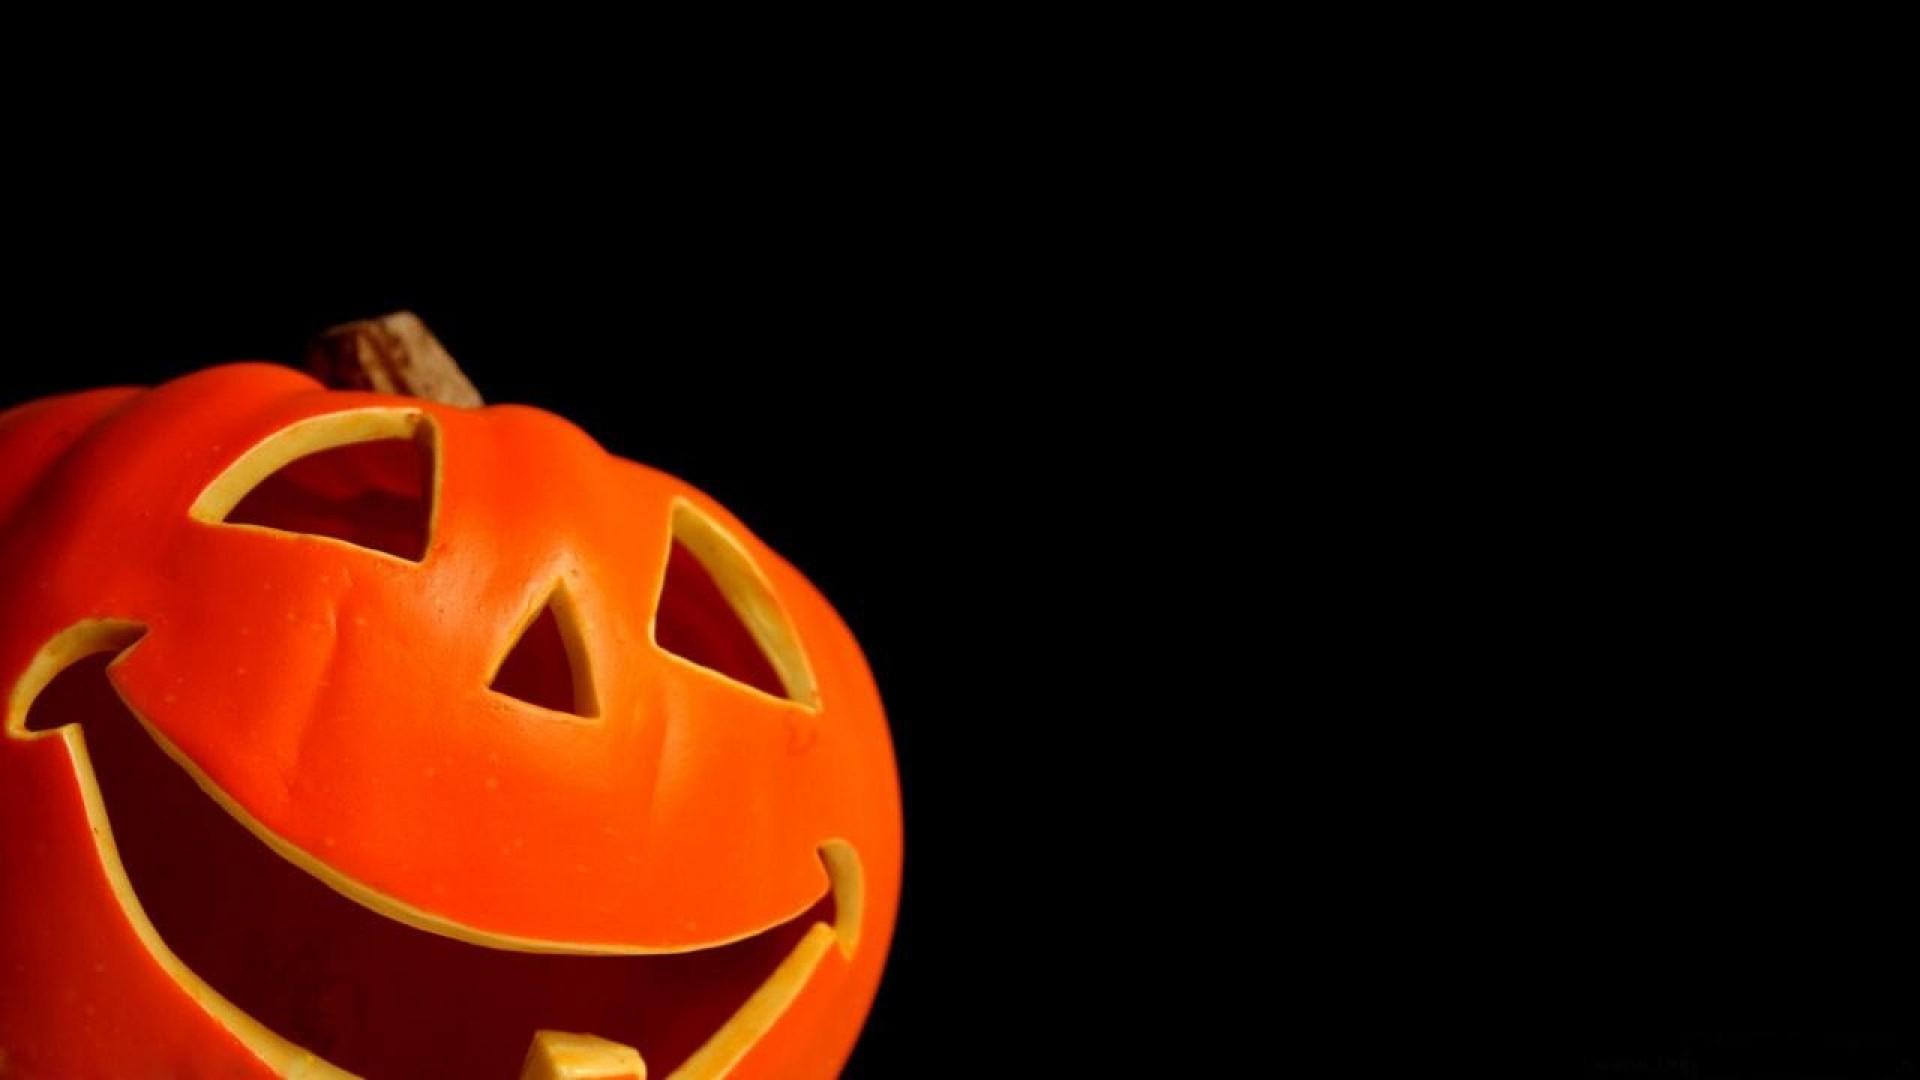 Fall Pumpkin Iphone Wallpapers Pumpkin Background 183 ① Download Free Full Hd Backgrounds